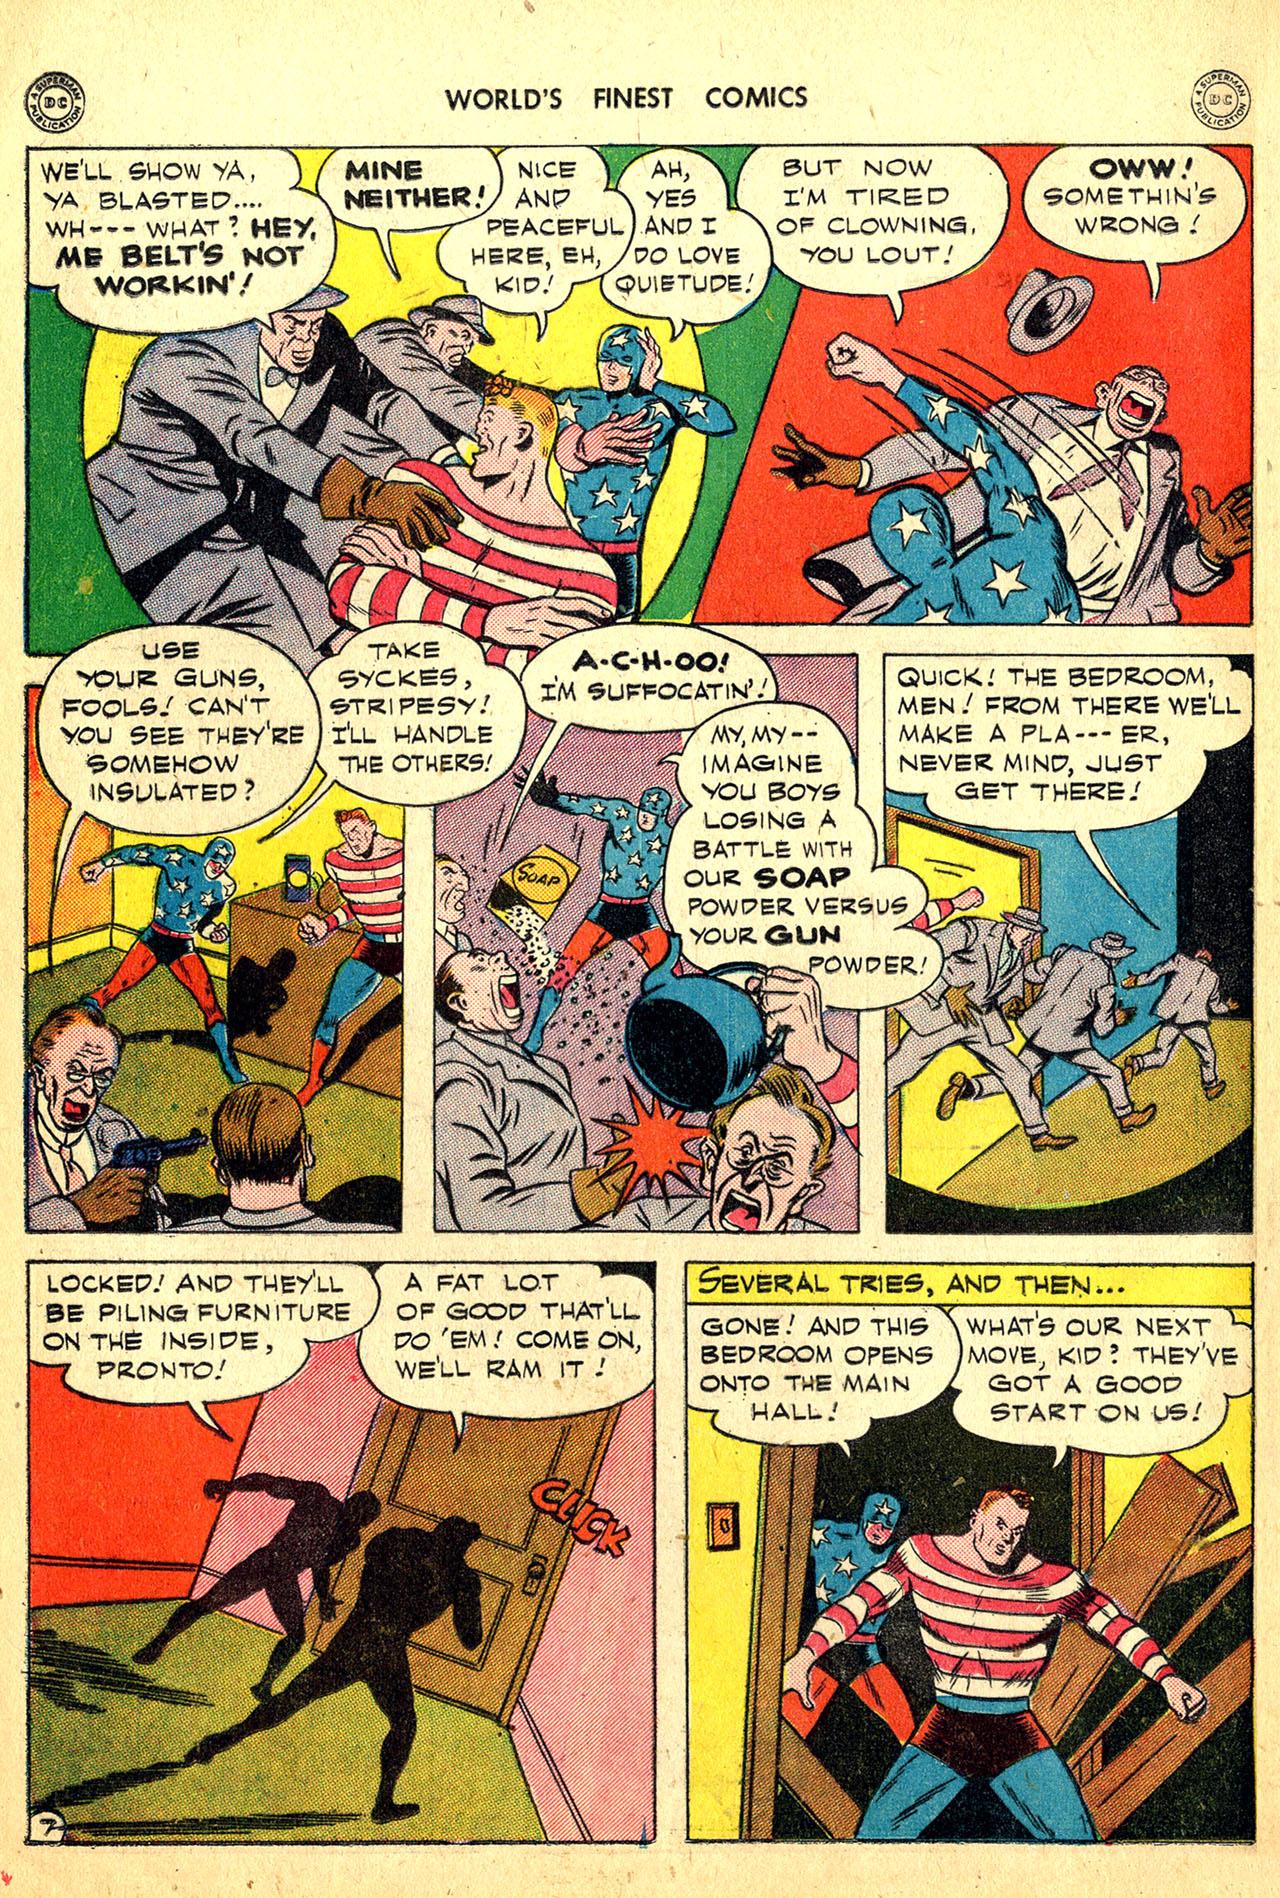 Read online World's Finest Comics comic -  Issue #18 - 22